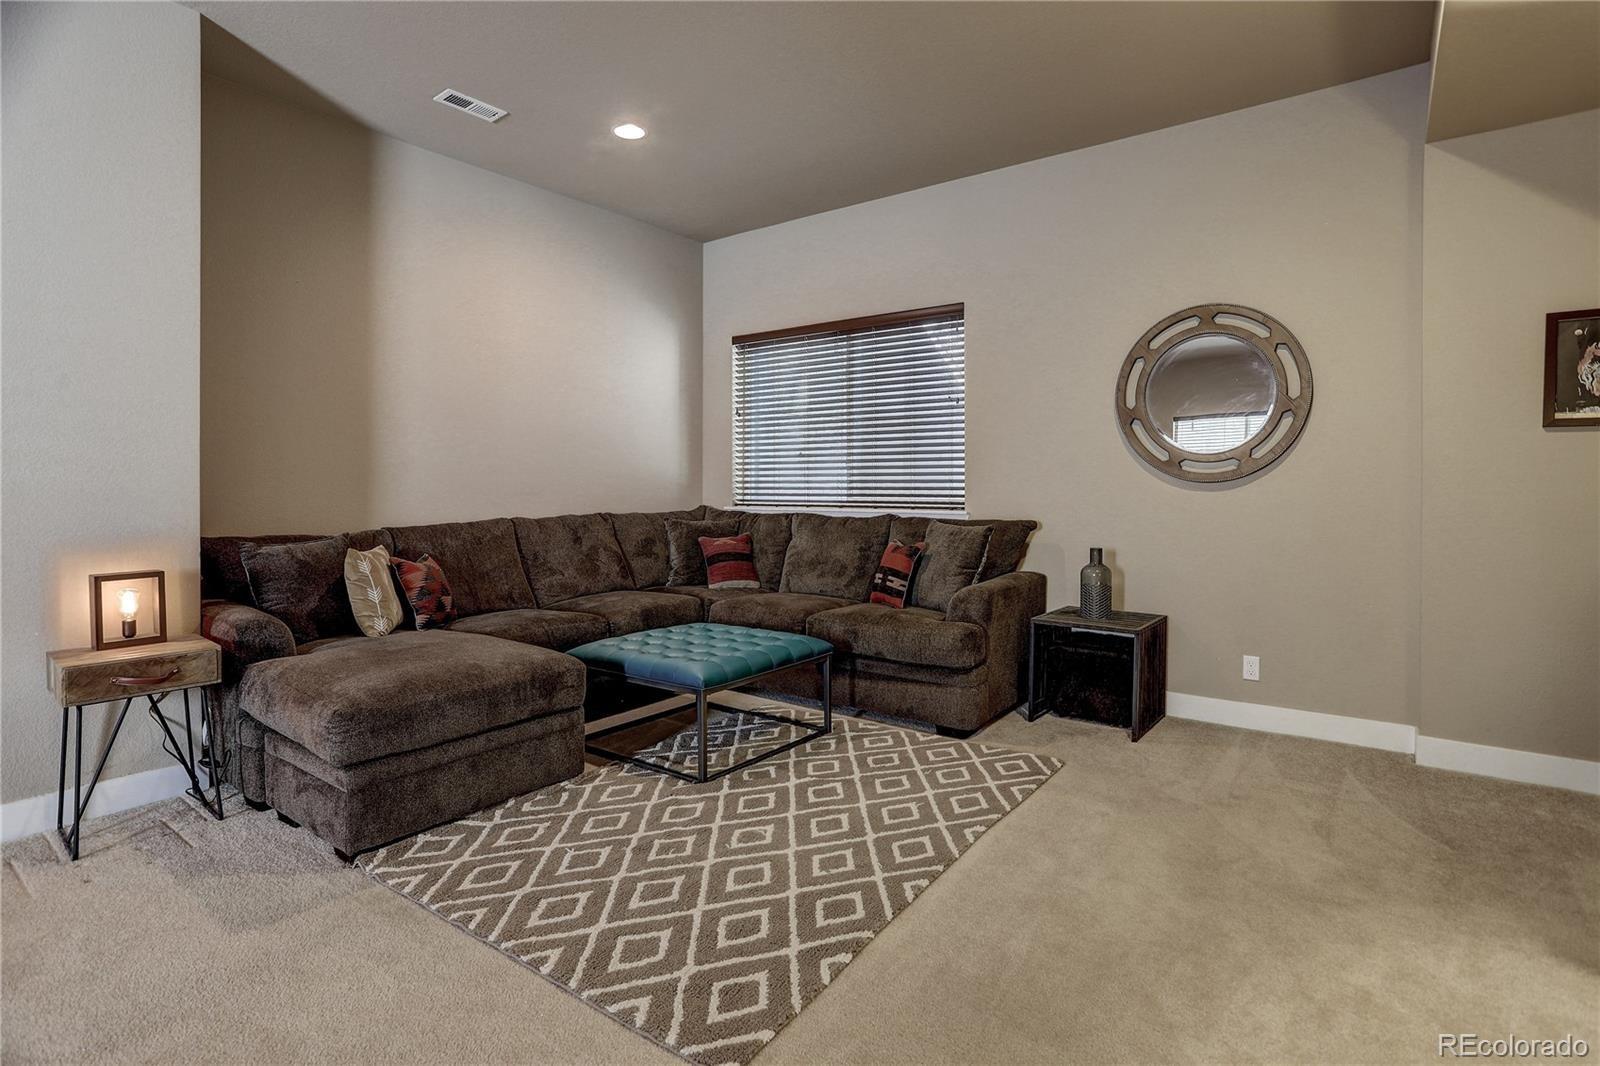 MLS# 6992885 - 33 - 8084 E 31st Avenue, Denver, CO 80238